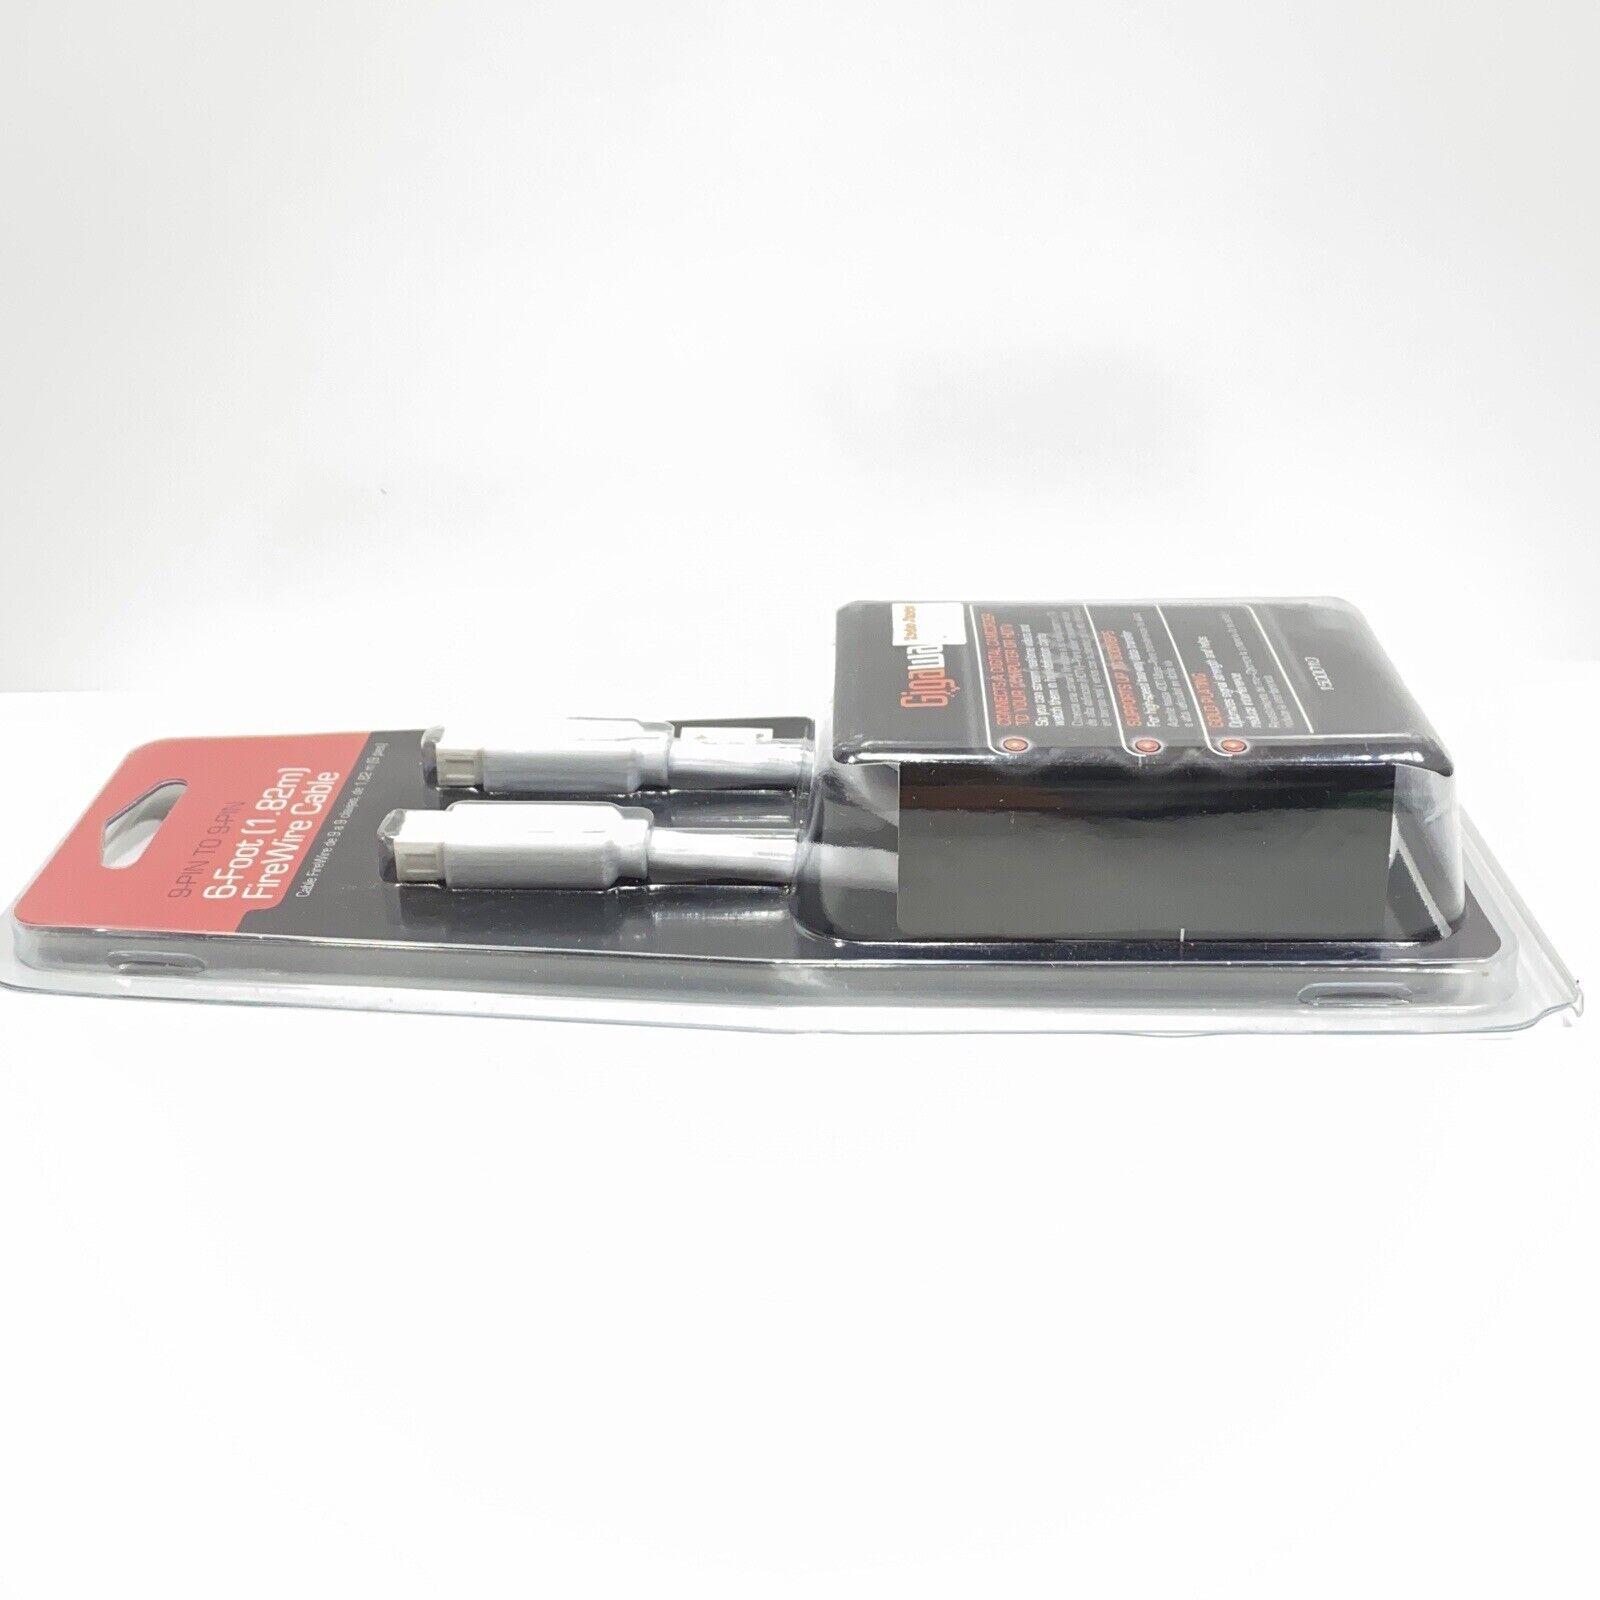 RadioShack GIGAWARE 6 FOOT FIREWIRE CABLE 9-PIN TO 9-PIN 1500010